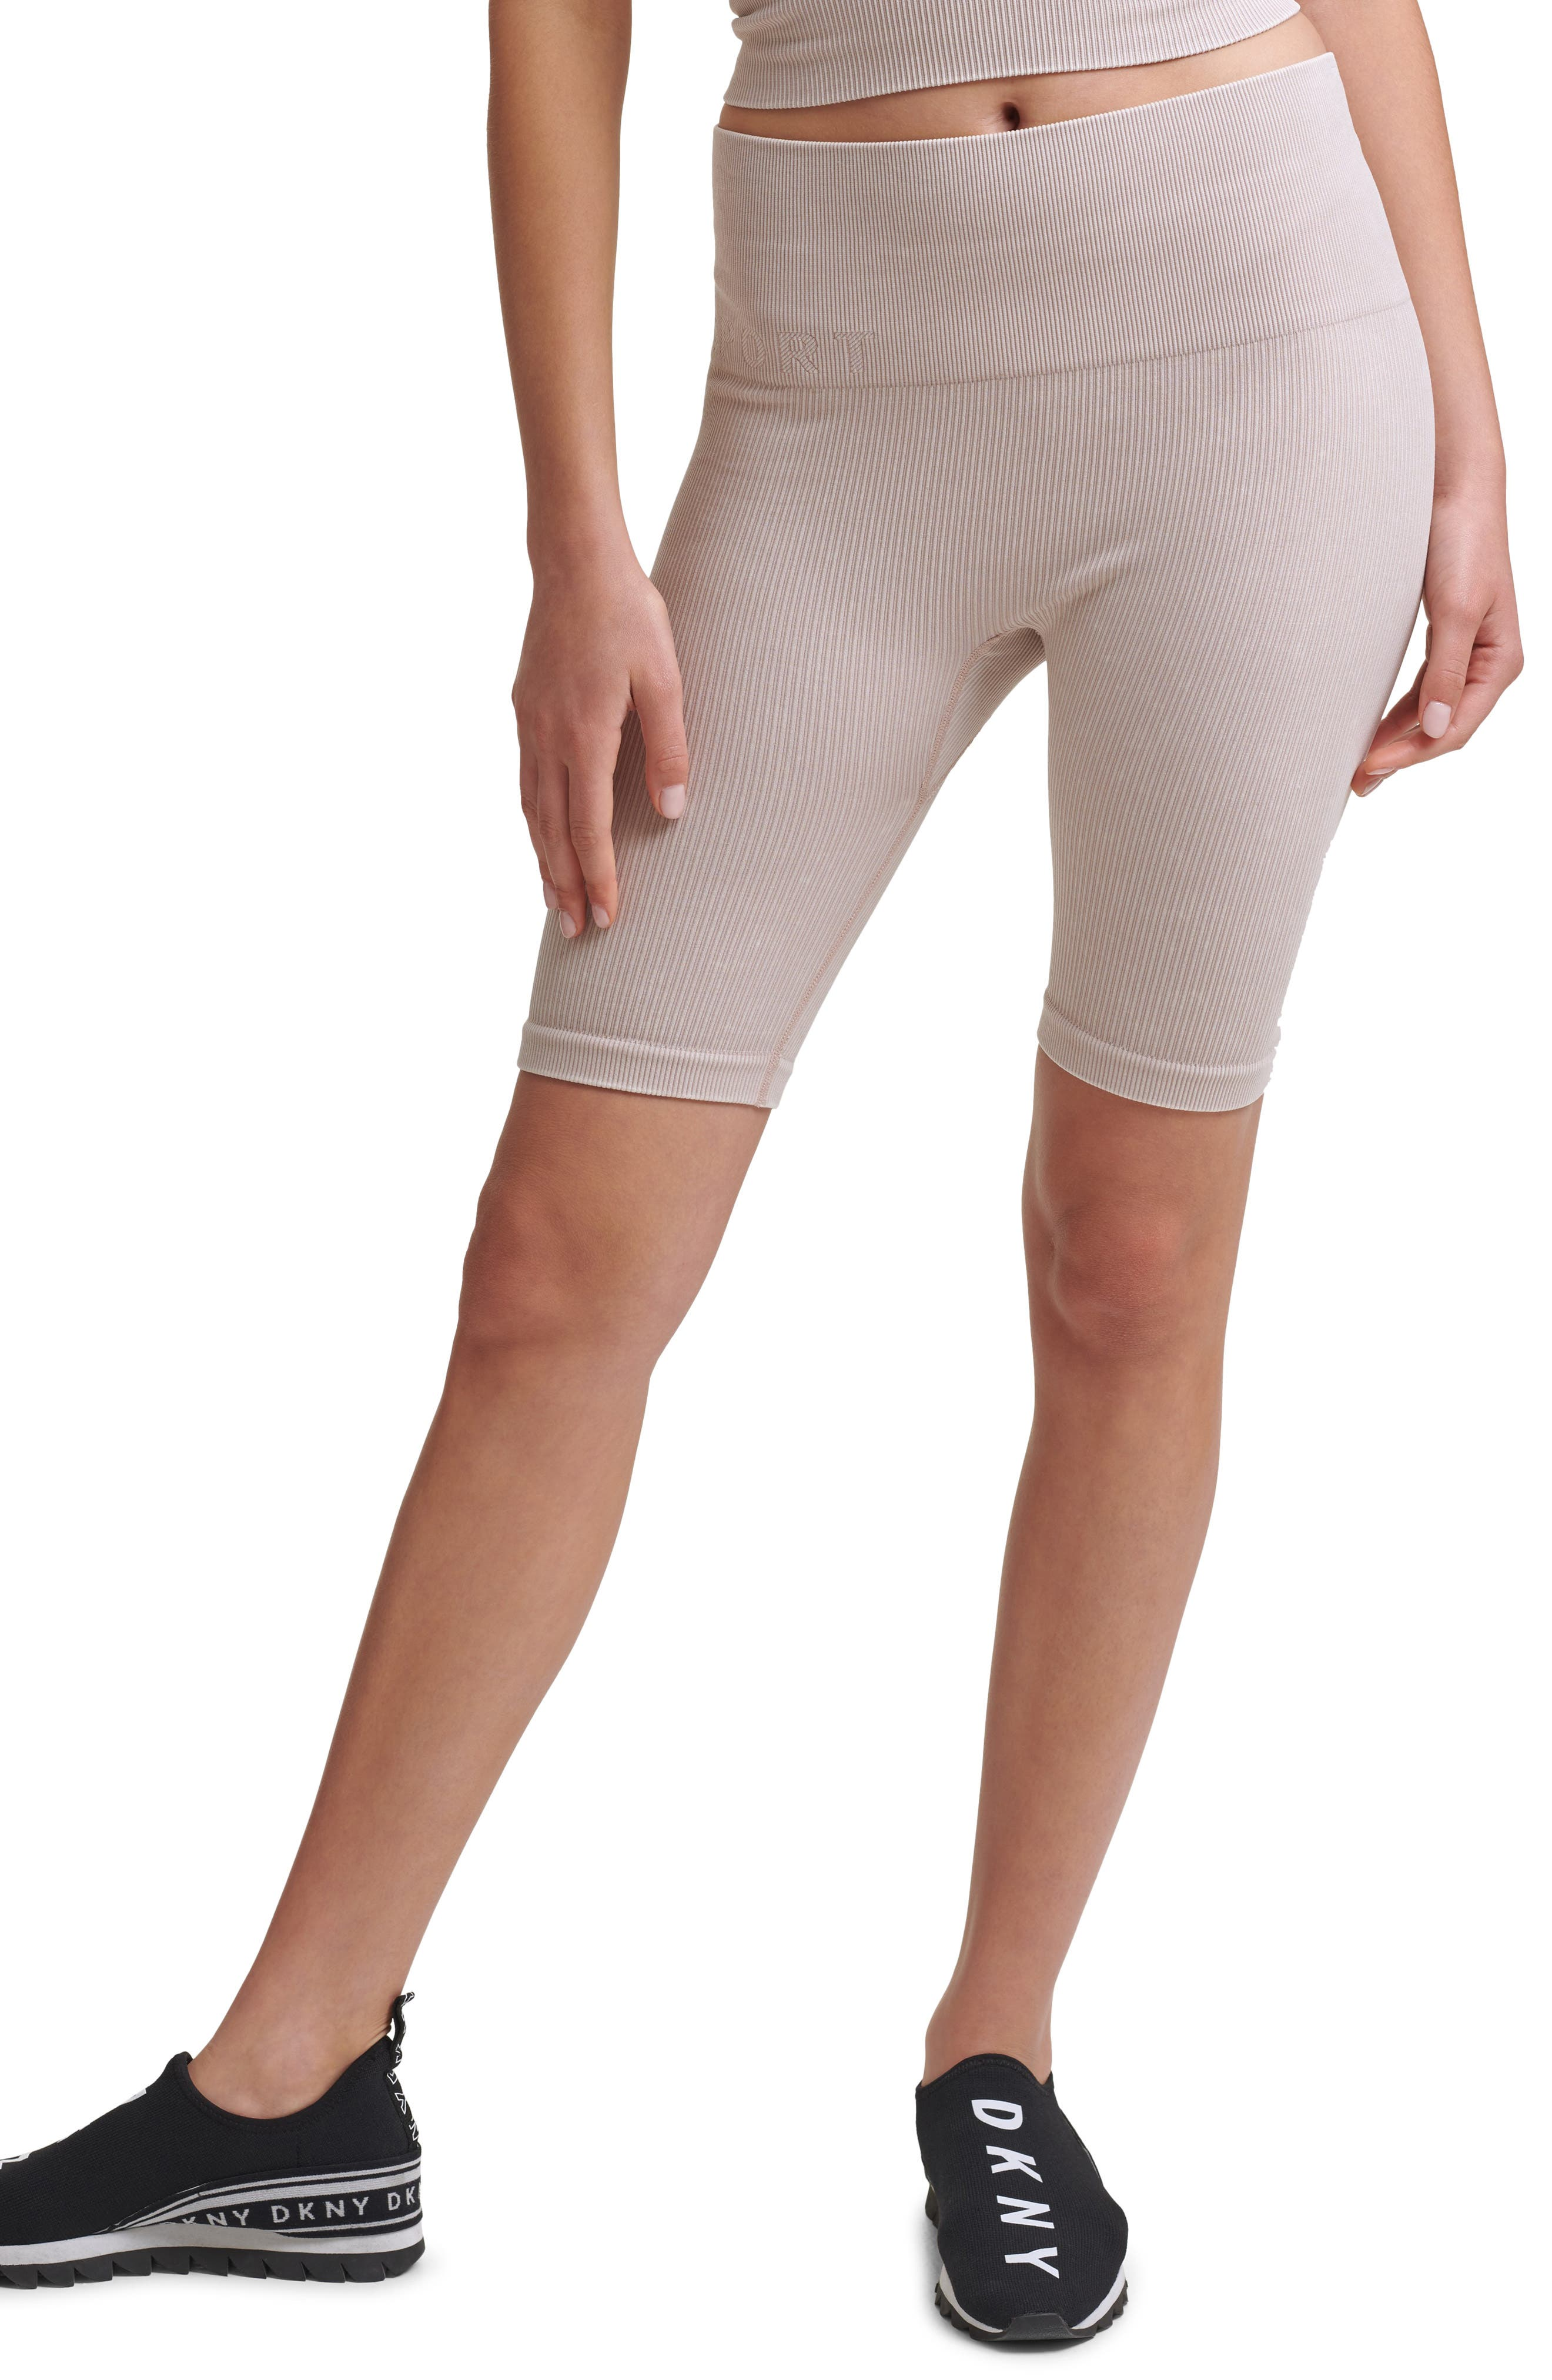 High Waist Seamless Rib Bike Shorts